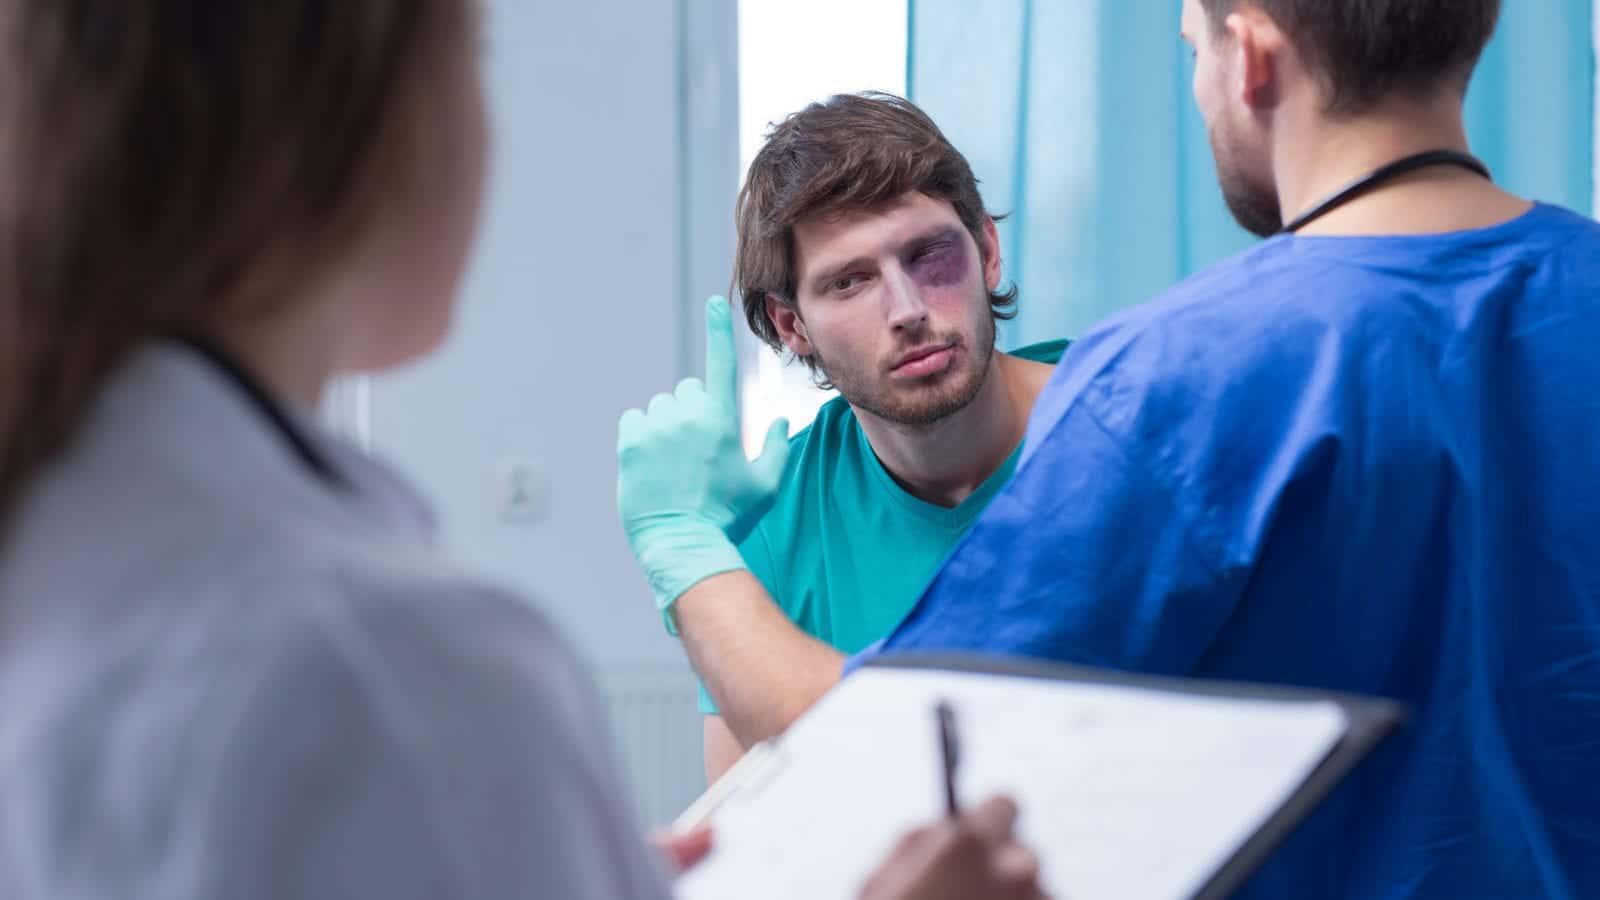 Male Patient Stock Photo